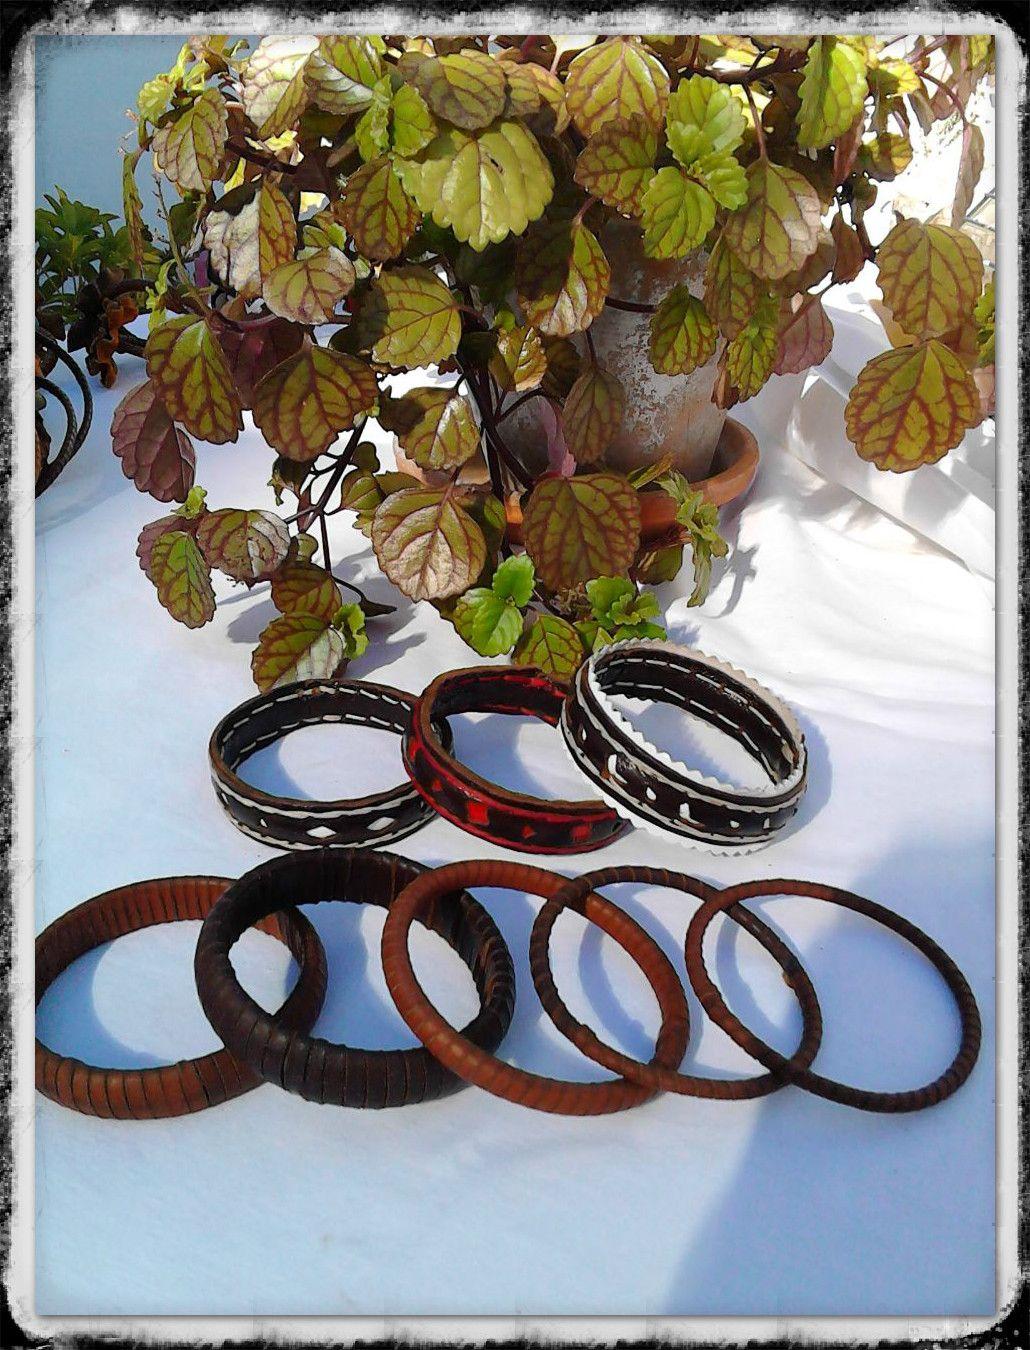 #pulseras de #cuero #hechasamano #100% a #mano, #hechoenAndalucia #Andalucia #Sevilla #Alcoleadelrio www.cueroripkay.blogspot.com